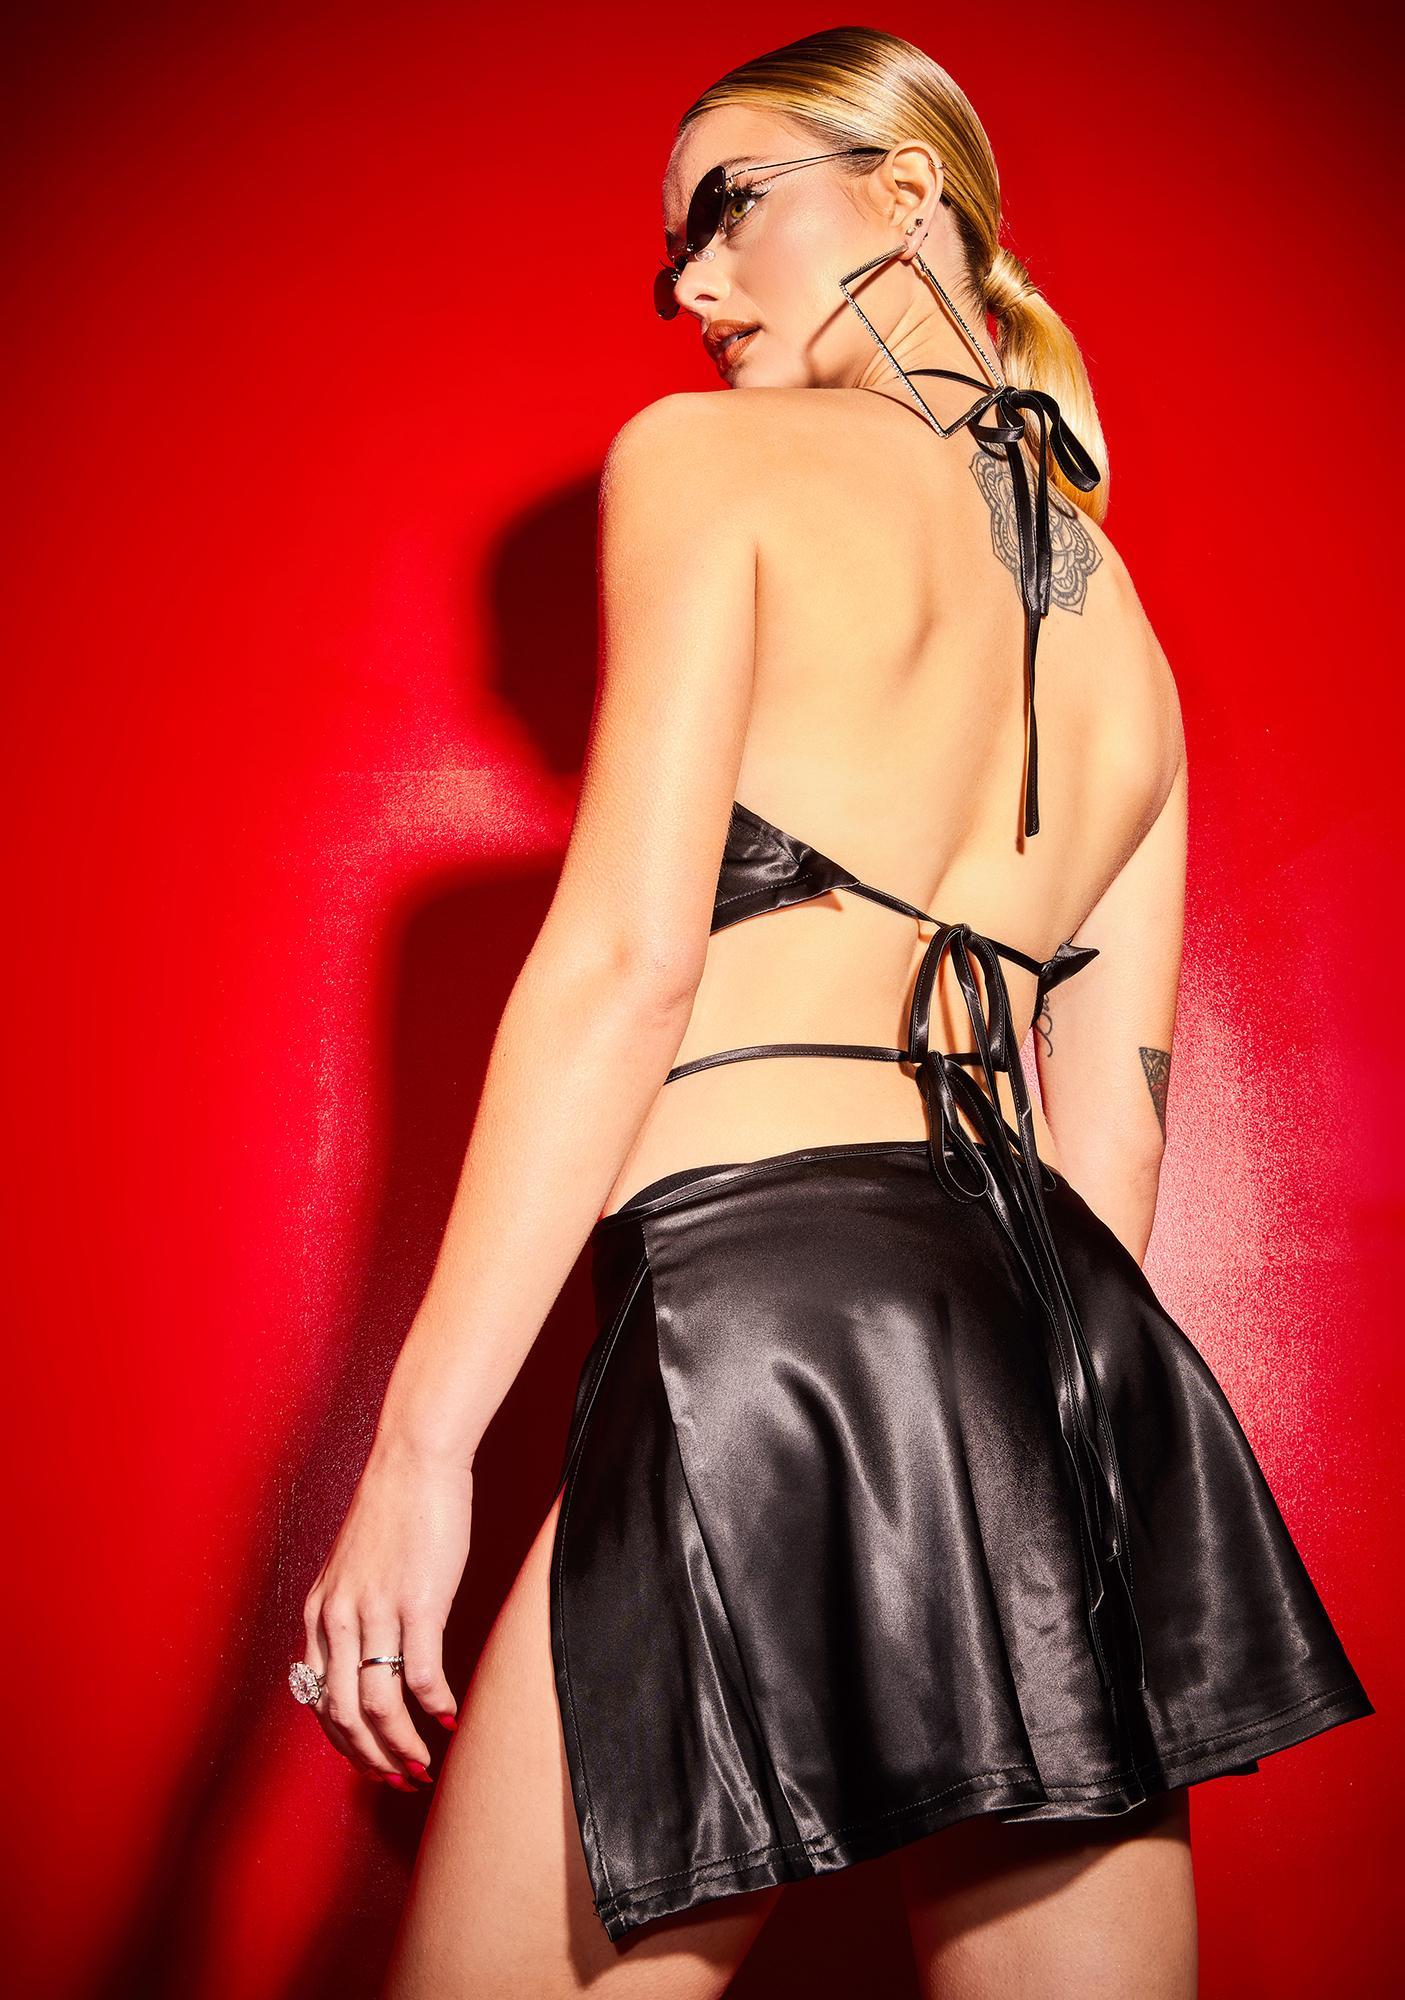 Poster Grl Wicked Hot Date Satin Skirt Set